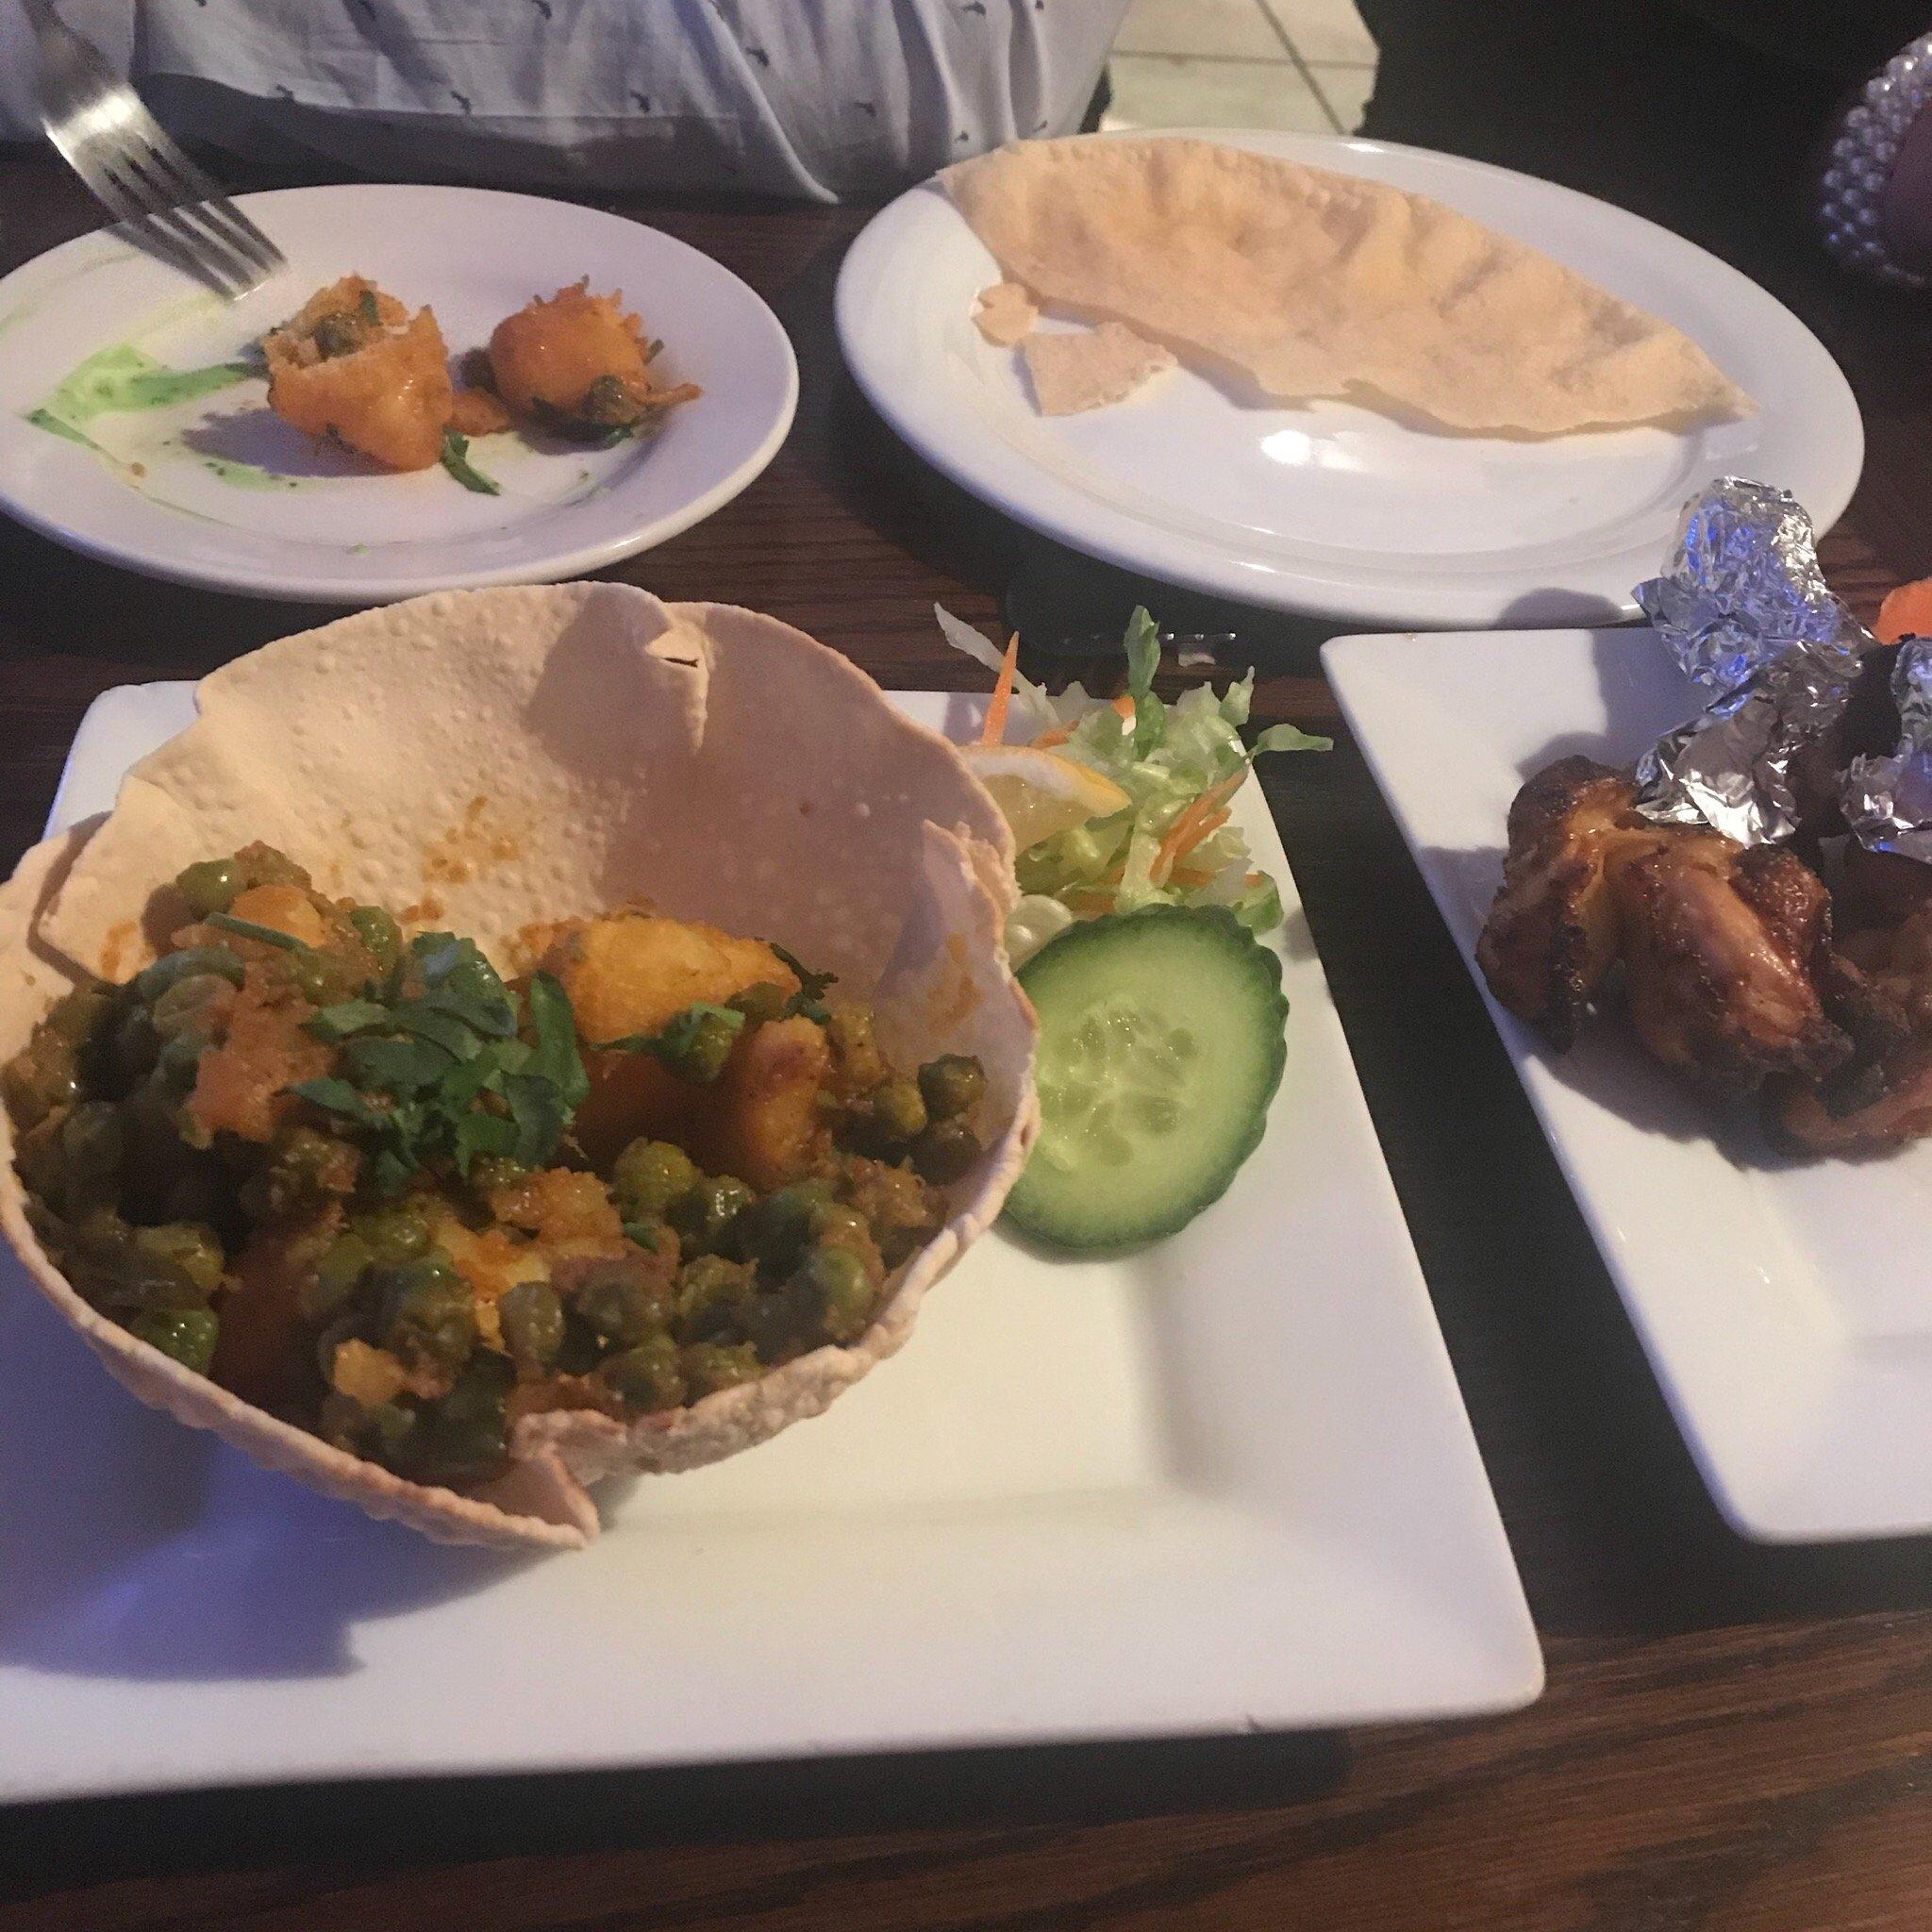 Kathmandu Kitchen Nepalese & Indian Restaurant | 9 Botanic Avenue, Belfast BT7 1JG | +44 28 9024 9264